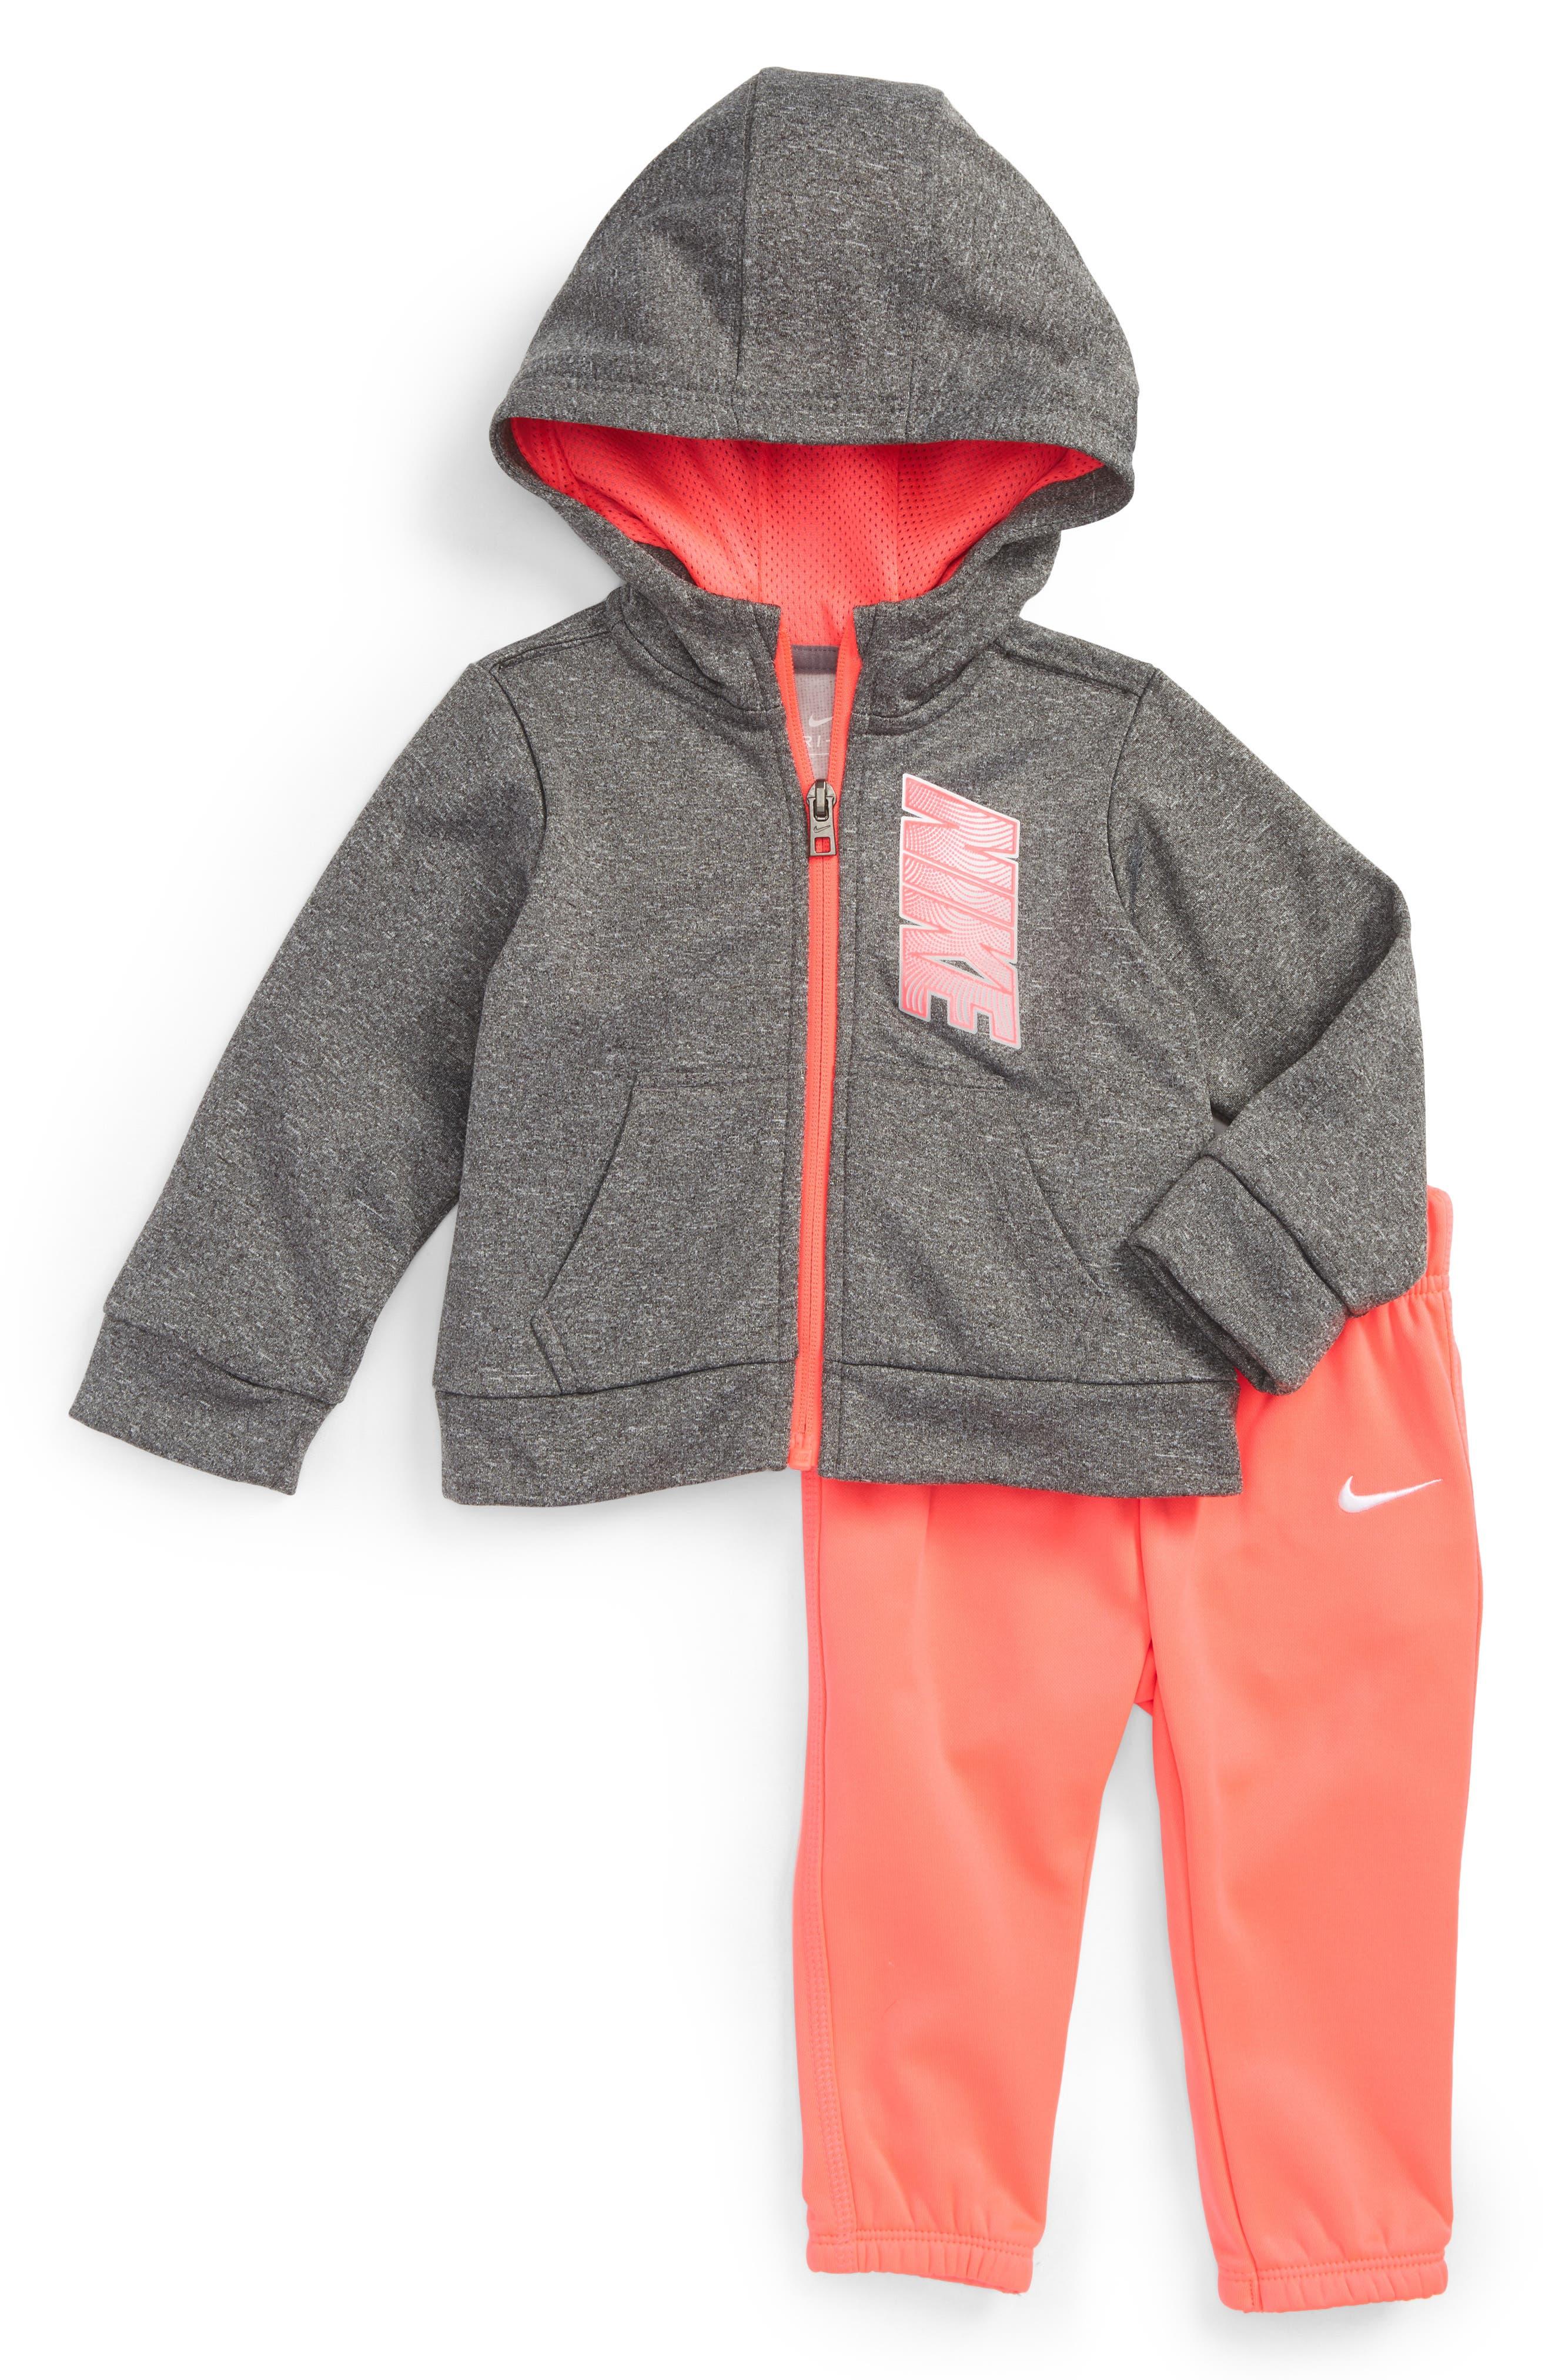 Main Image - Nike Therma-FIT Fleece Hoodie & Pants Set (Baby Girls)